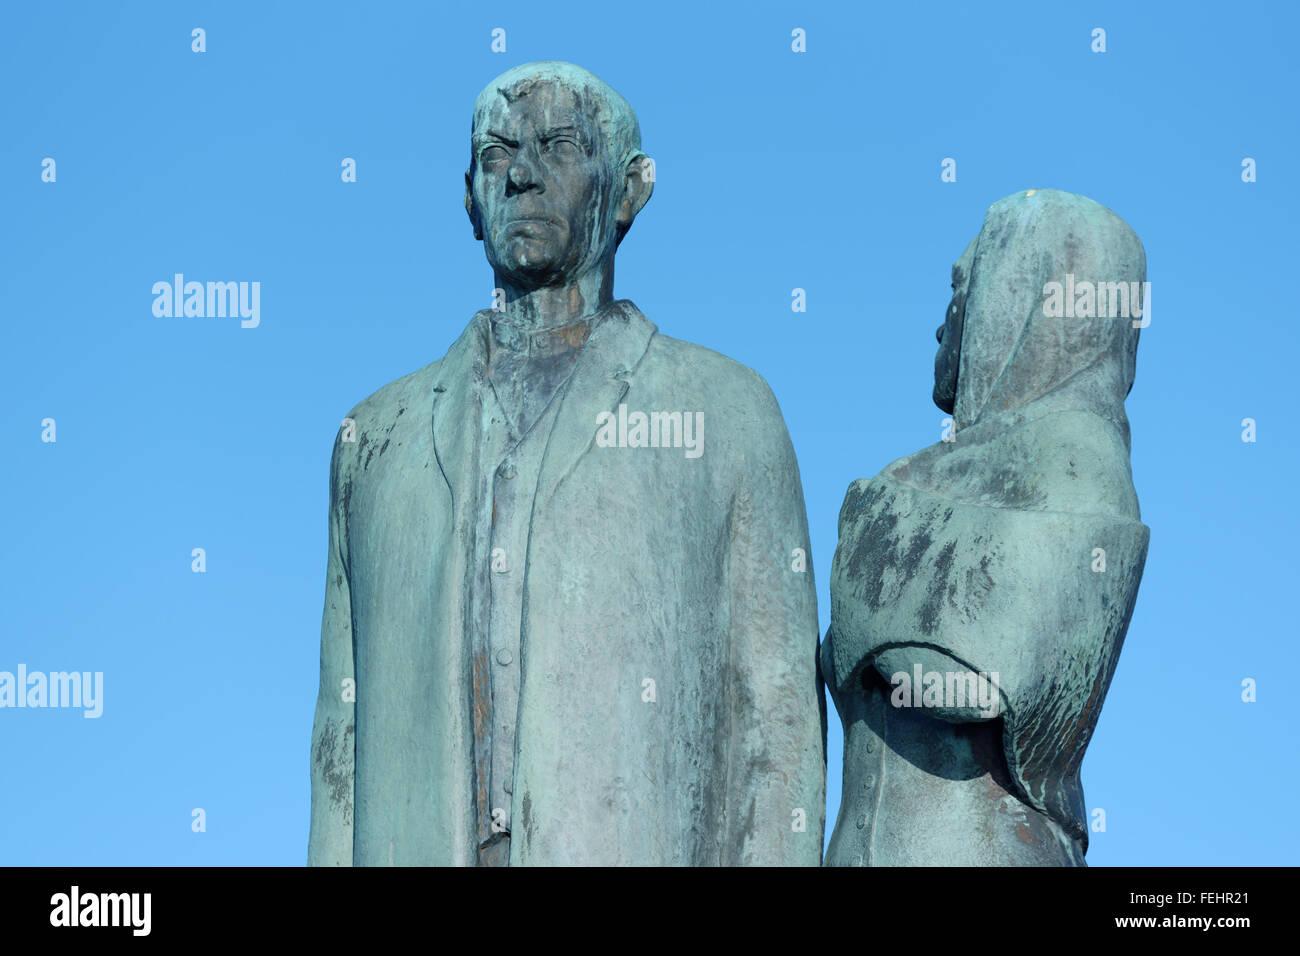 Karlshamn, Sweden - February 04, 2016: The emigrant monument by Axel Olsson, commemorating the Swedish migration - Stock Image